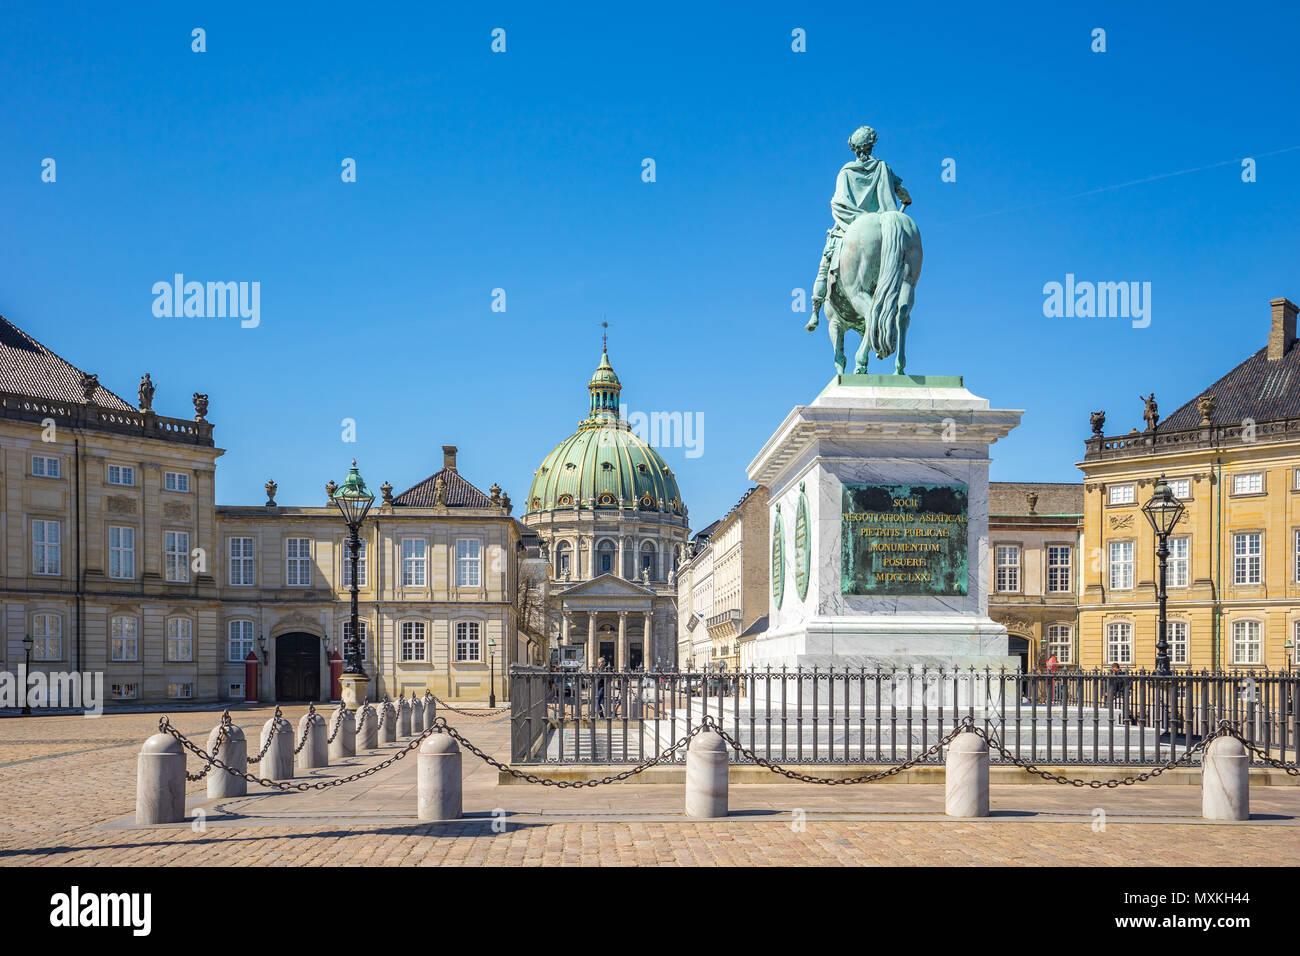 Amalienborg Palace in Copenhagen city, Denmark. Stock Photo